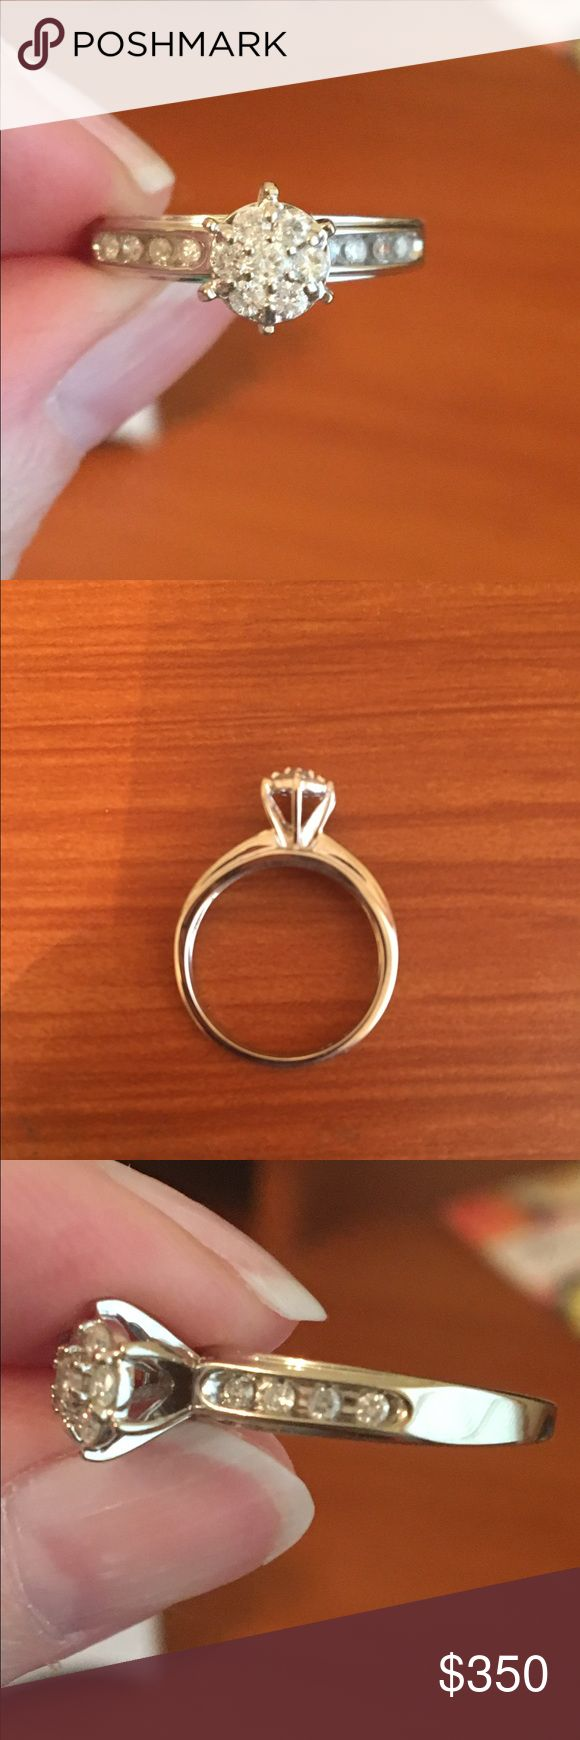 Zales 10 karat white hold 1/2 karat diamond ring! White gold gorgeous diamond cluster ring purchased at zales 1/2 karat has four small diamonds on each side size 7😄💍 Zales Jewelry Rings